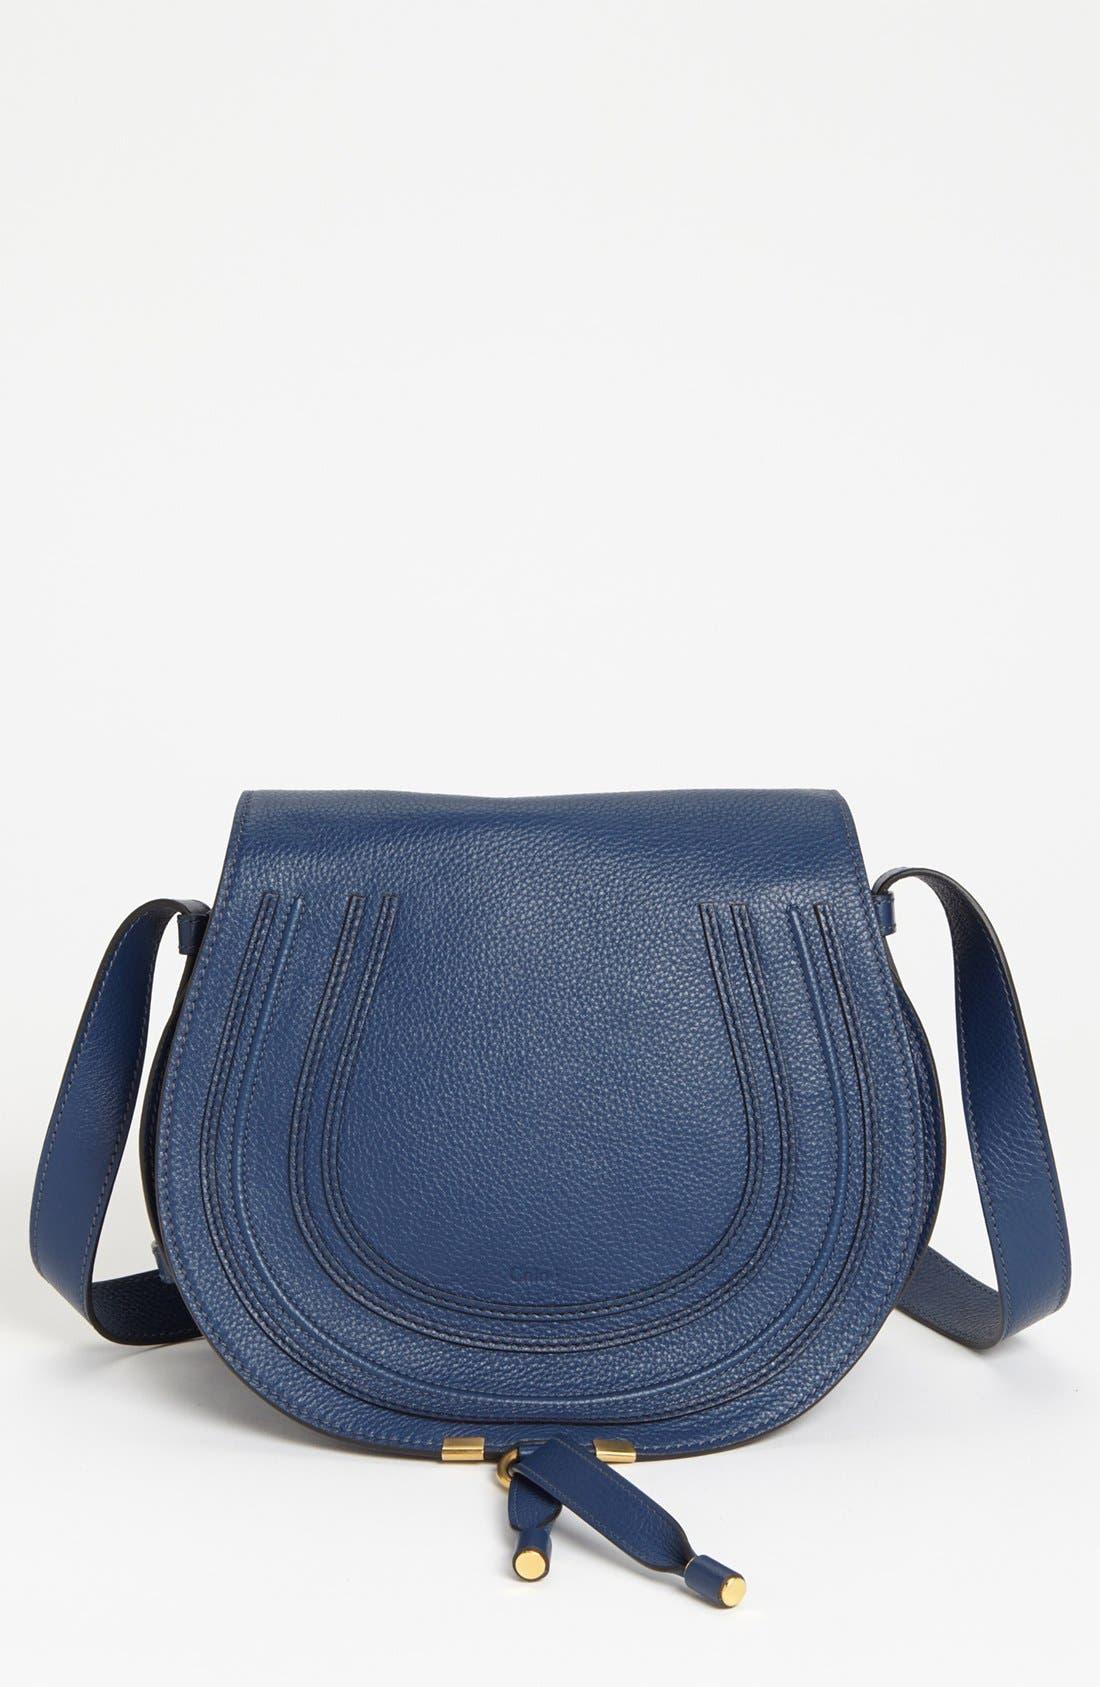 'Marcie - Medium' Leather Crossbody Bag,                             Main thumbnail 1, color,                             Royal Navy